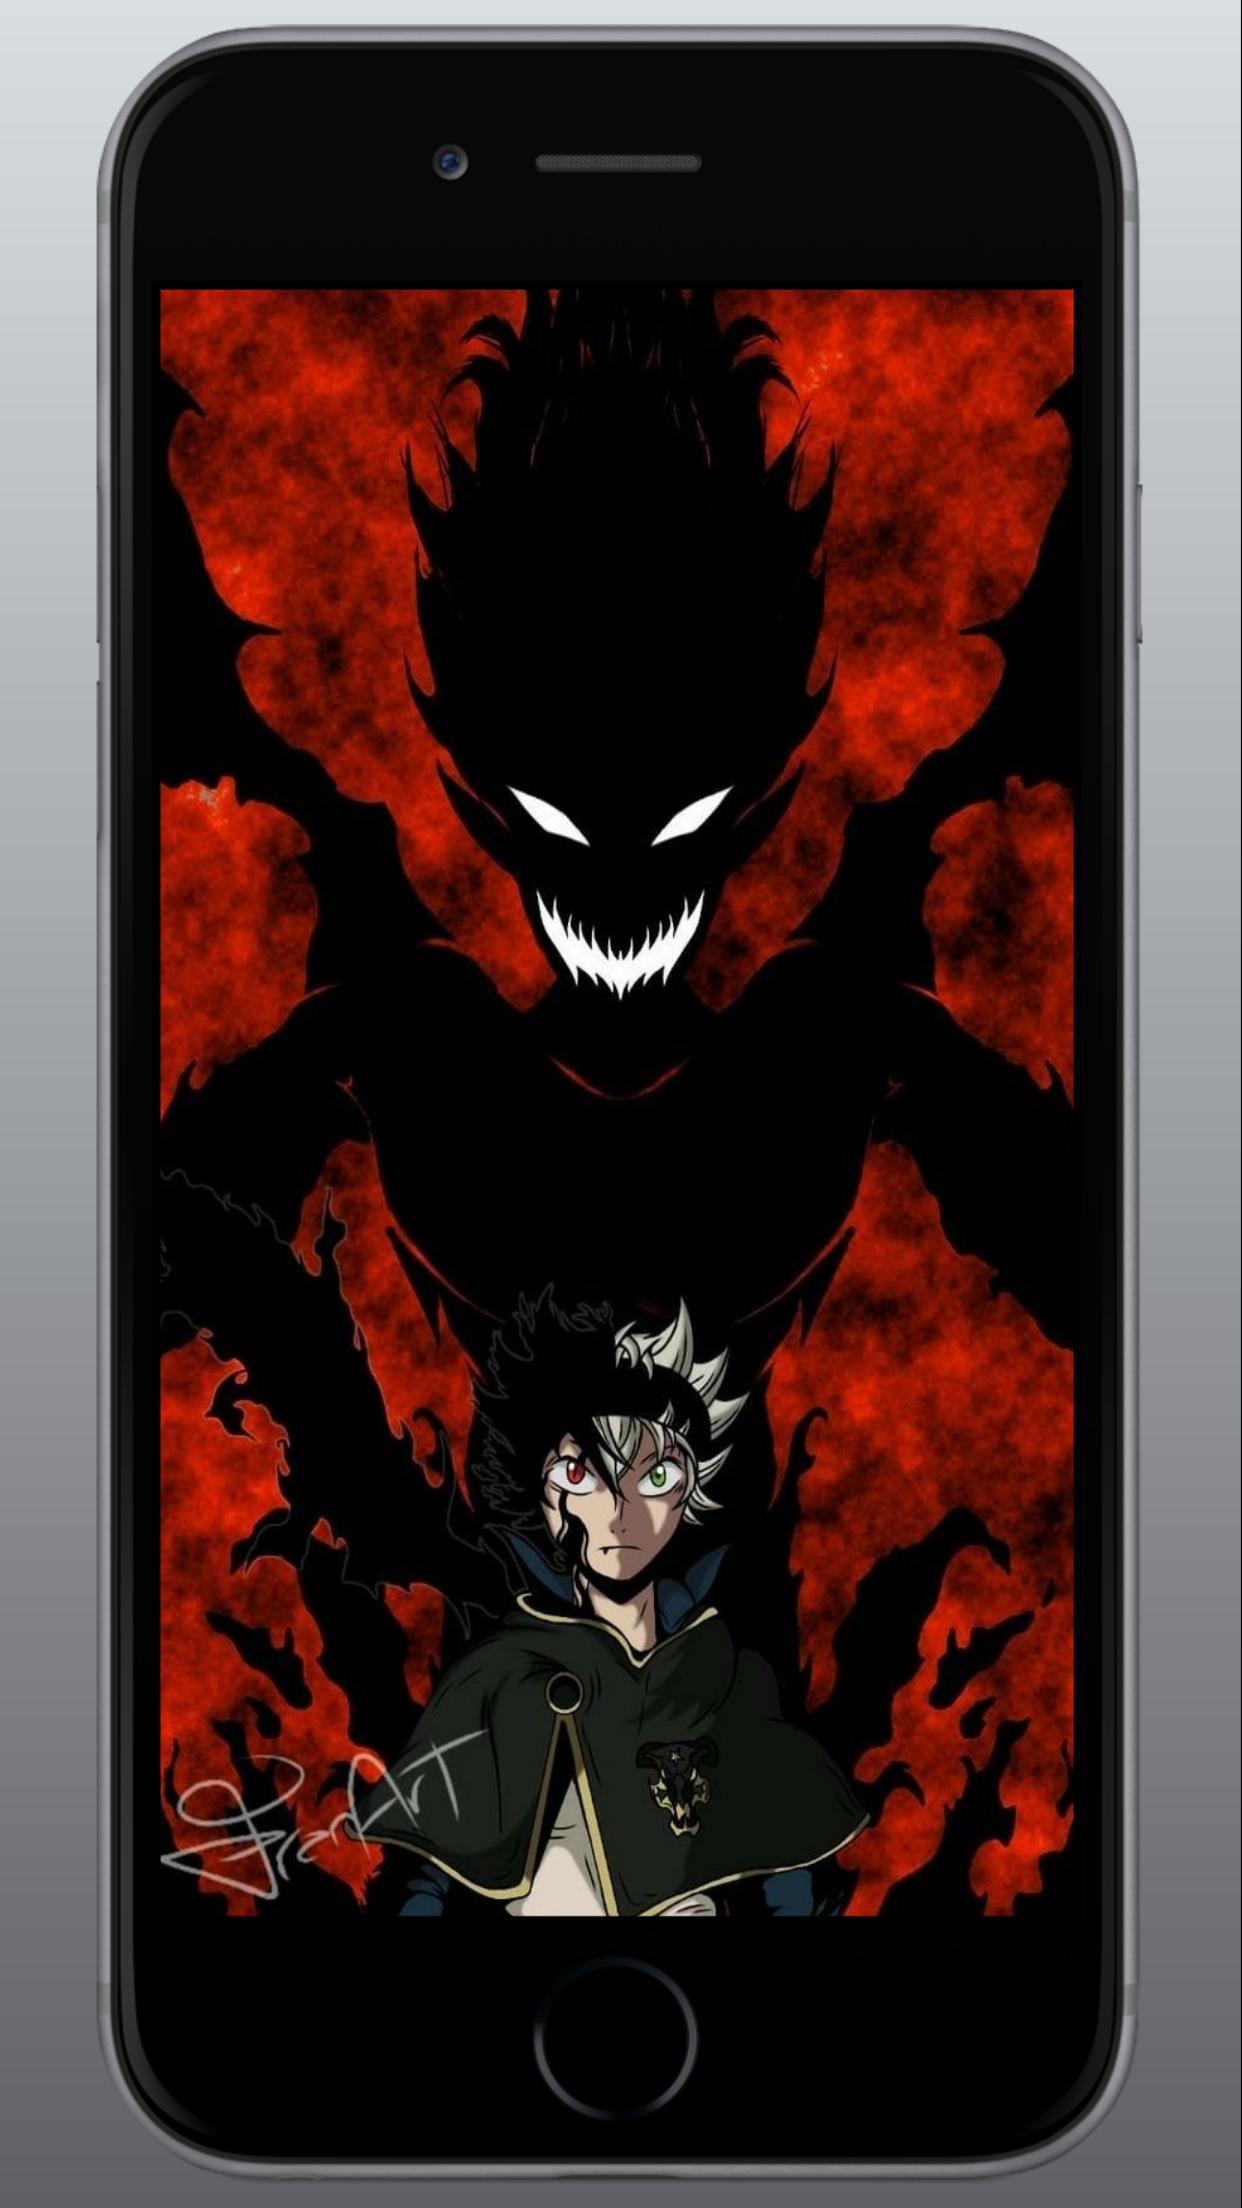 Android 用の Anime Wallpaper - Black Clover Wallpaper APK を ...